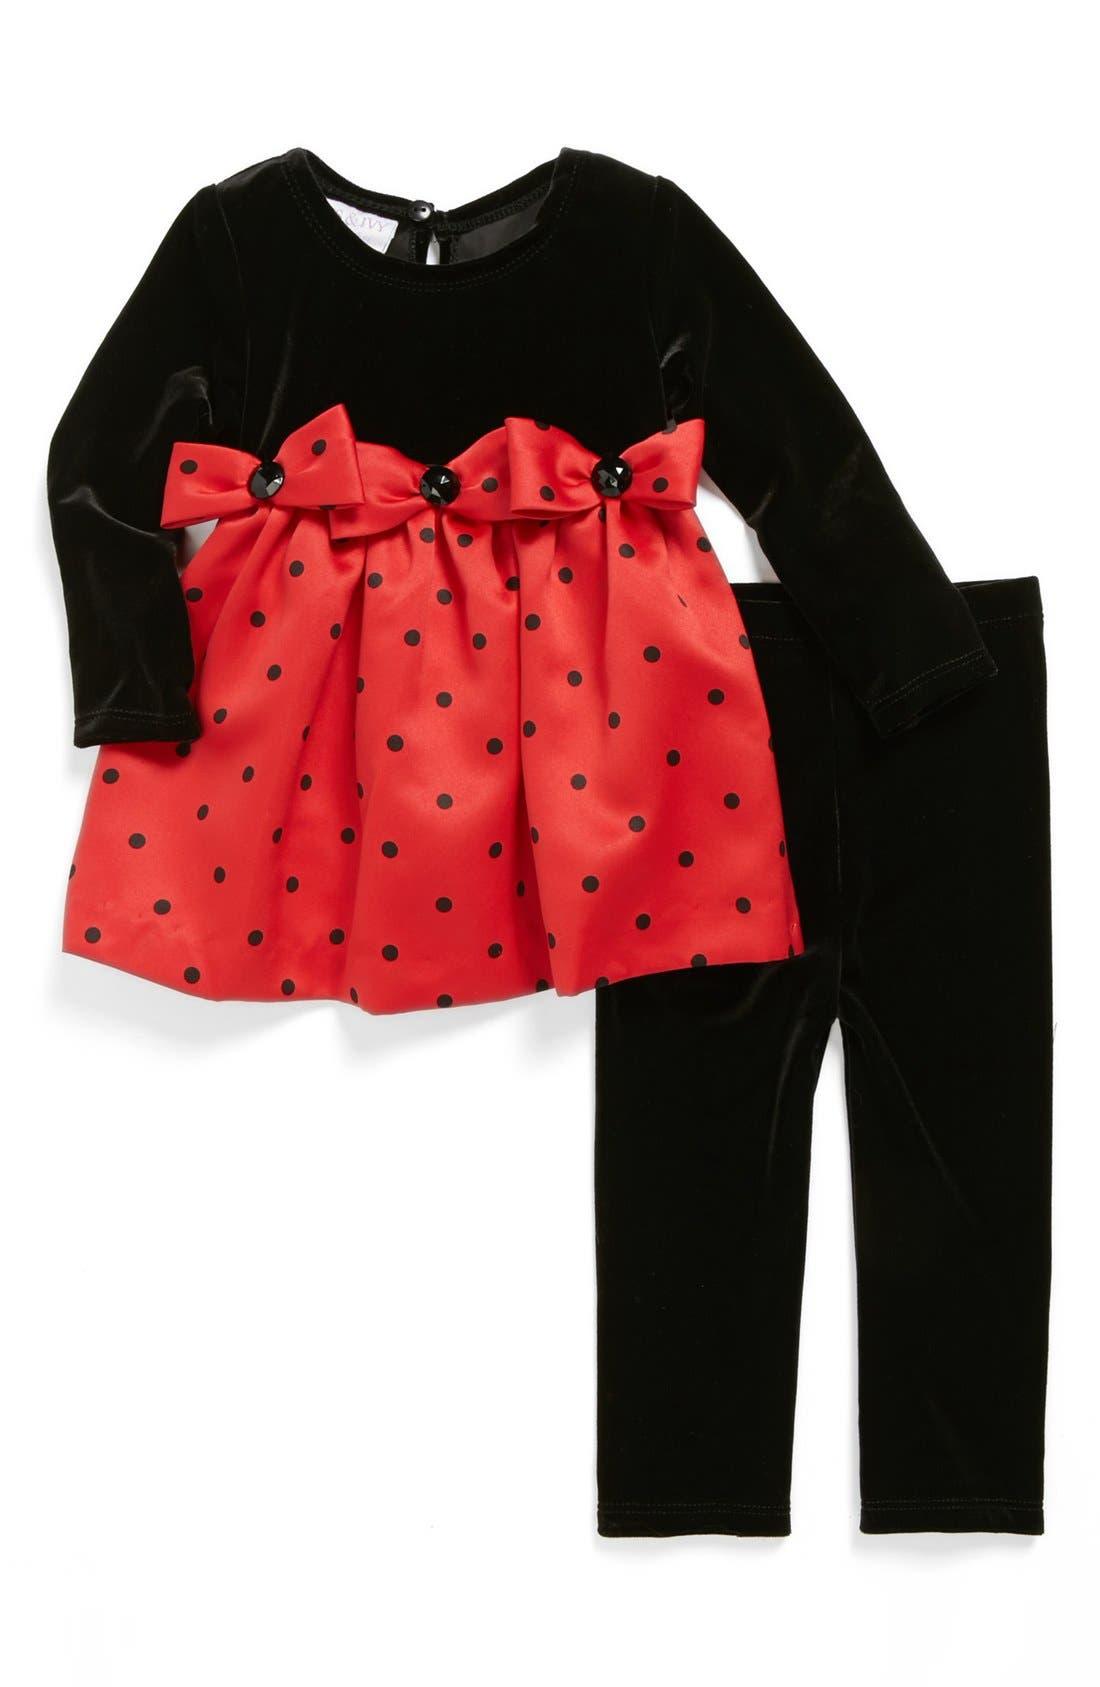 Alternate Image 1 Selected - Iris & Ivy Polka Dot Bow Top & Leggings (Baby Girls)